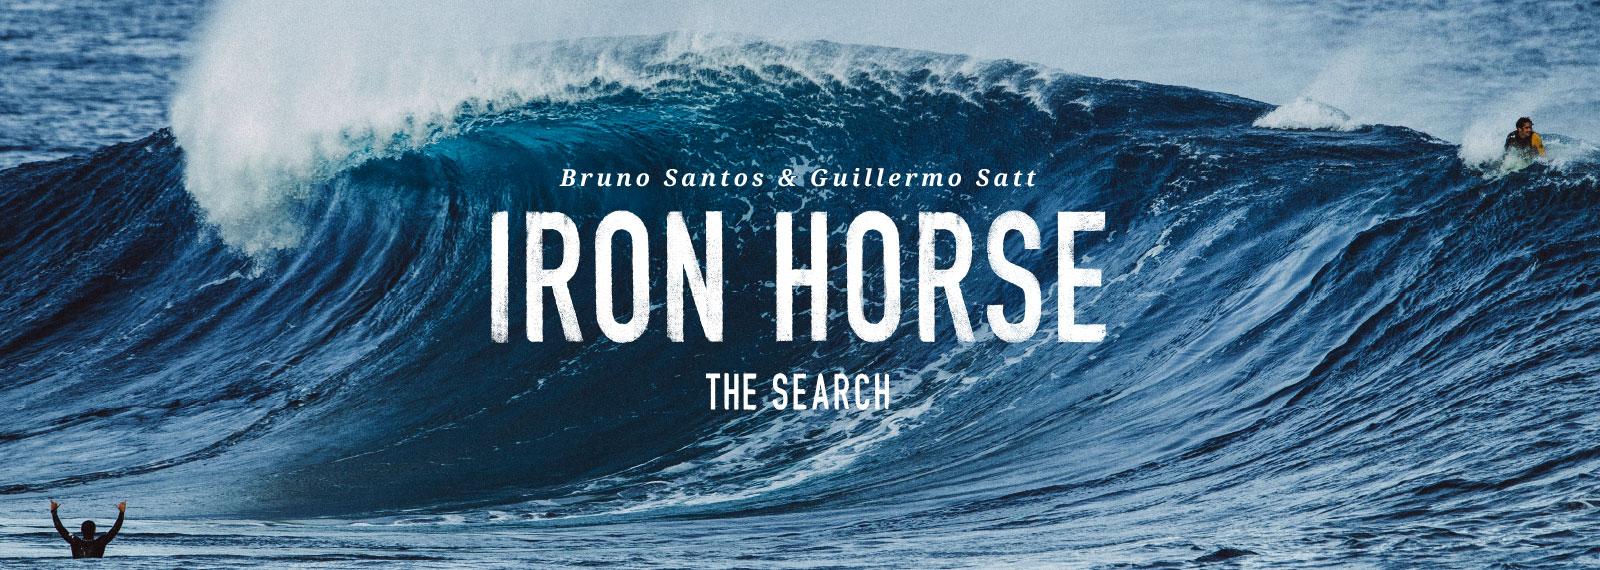 IronHorse_Homepage_AUS